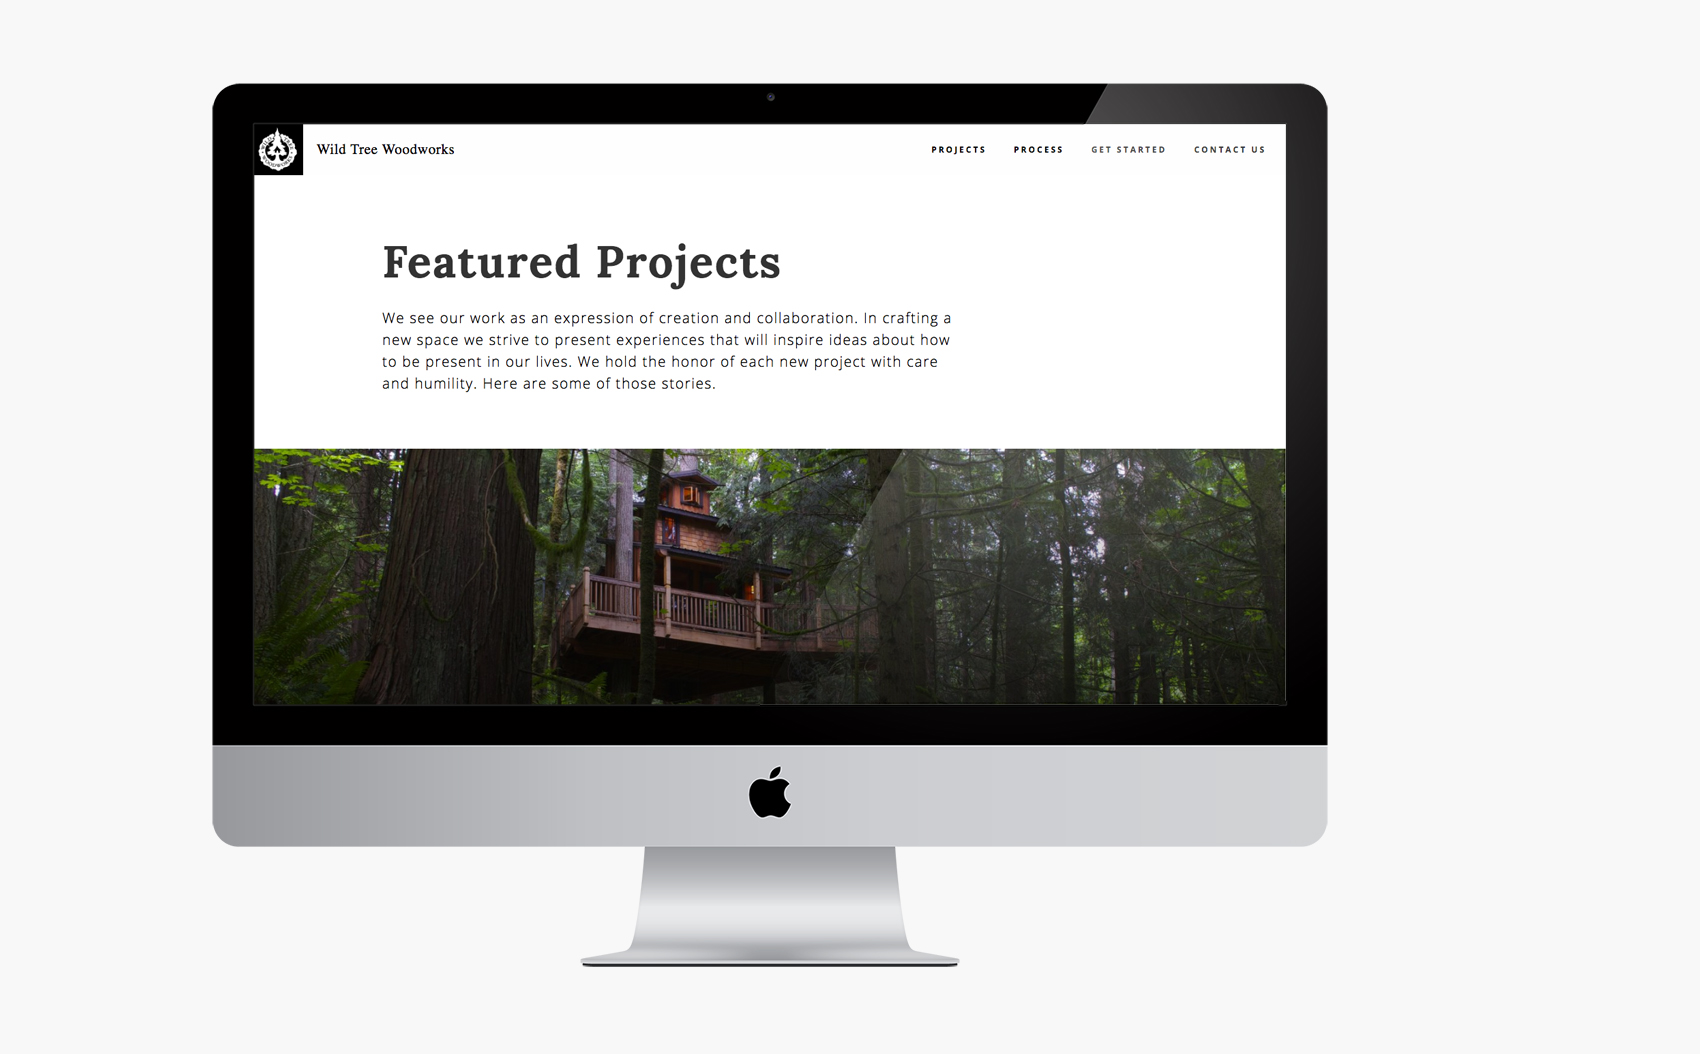 Wild Tree Woodworks